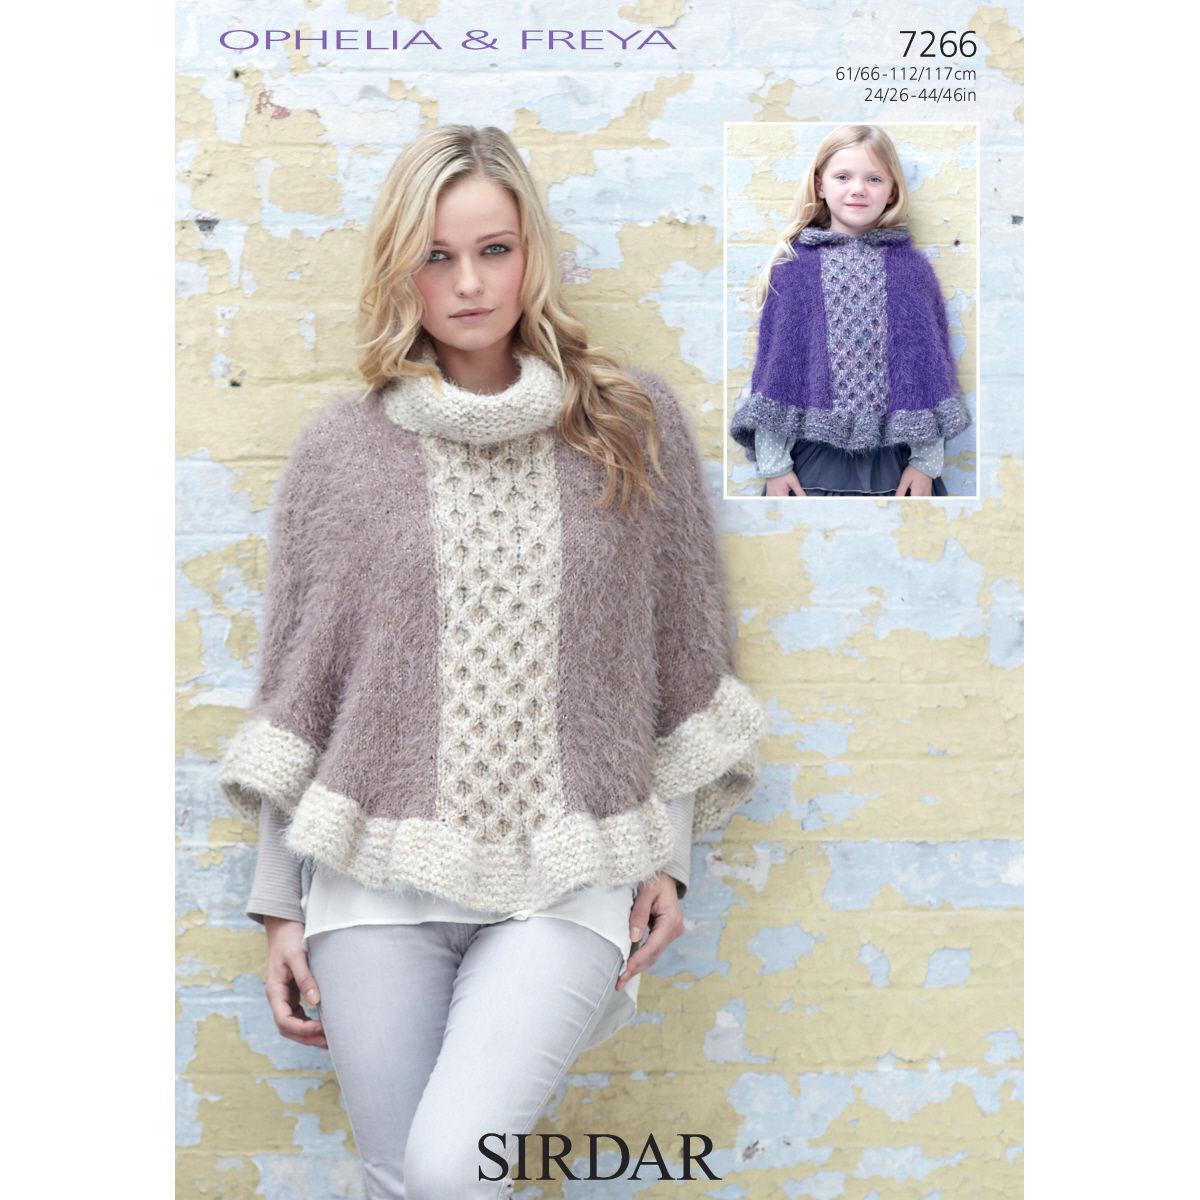 Free Knitting Pattern Chunky Cape : 7266 - SIRDAR OPHELIA & FREYA CHUNKY CAPE KNITTING PATTERN - TO FIT CHEST...